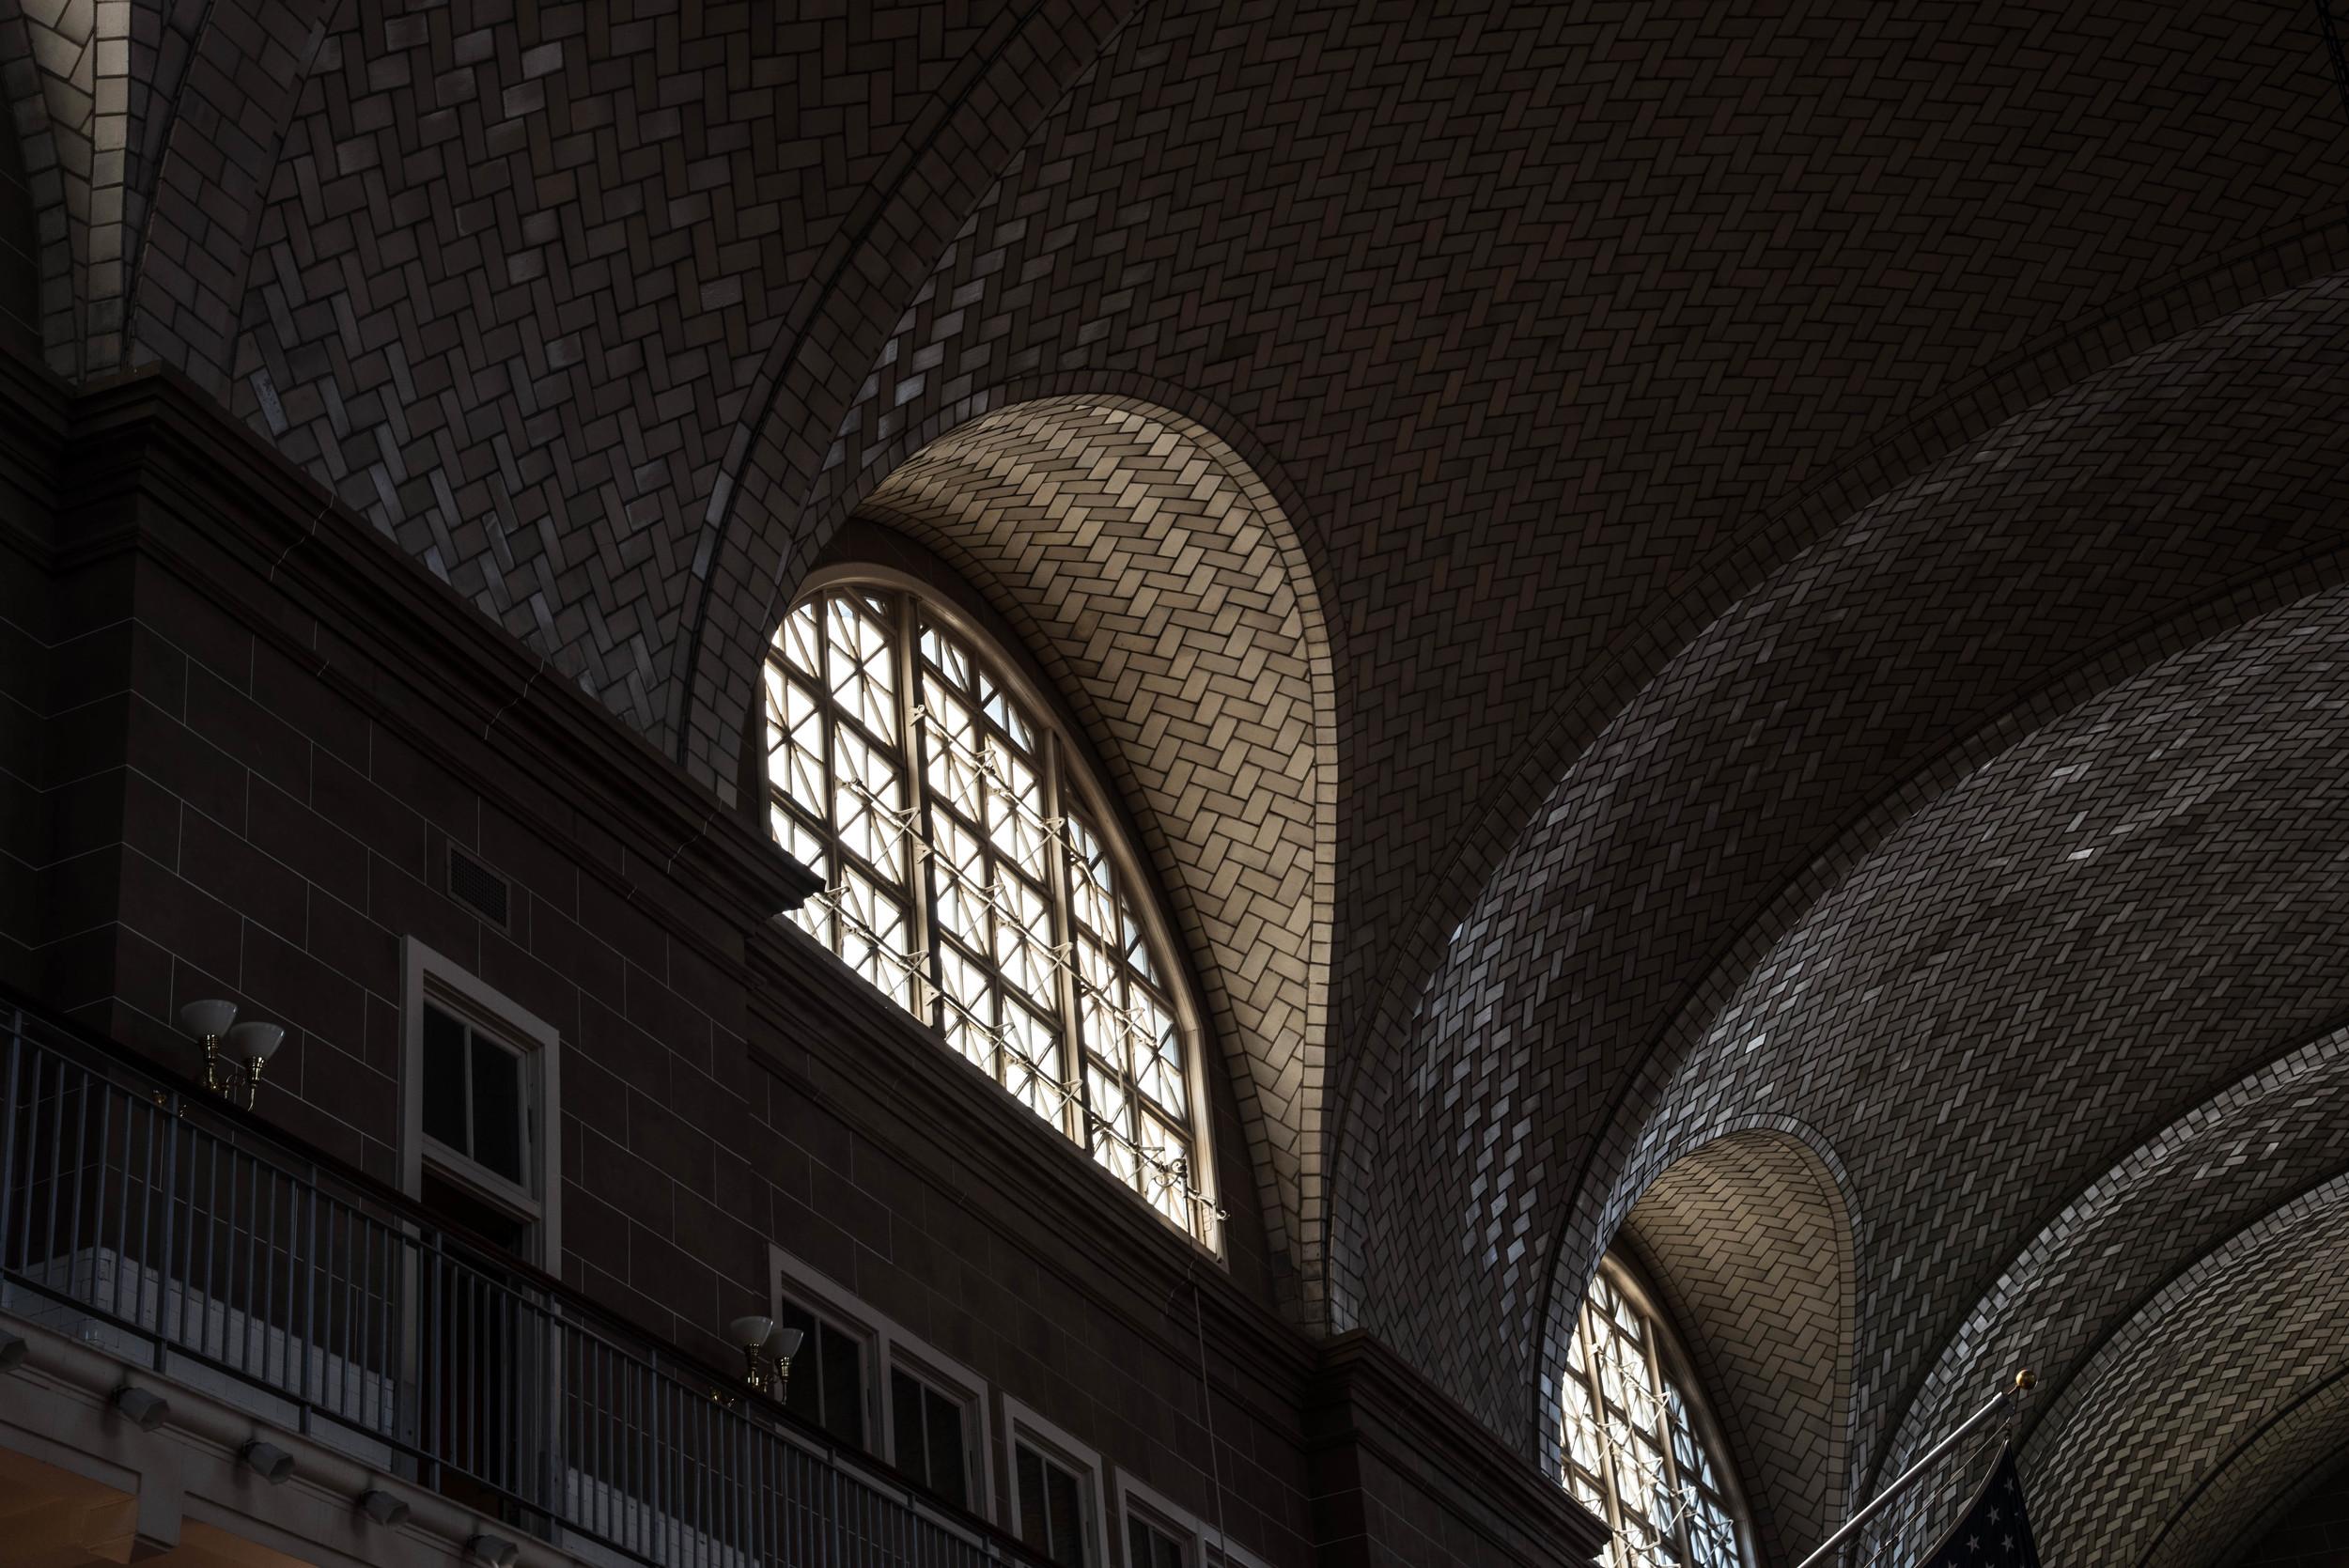 ROSE & IVY Journal Ellis Island